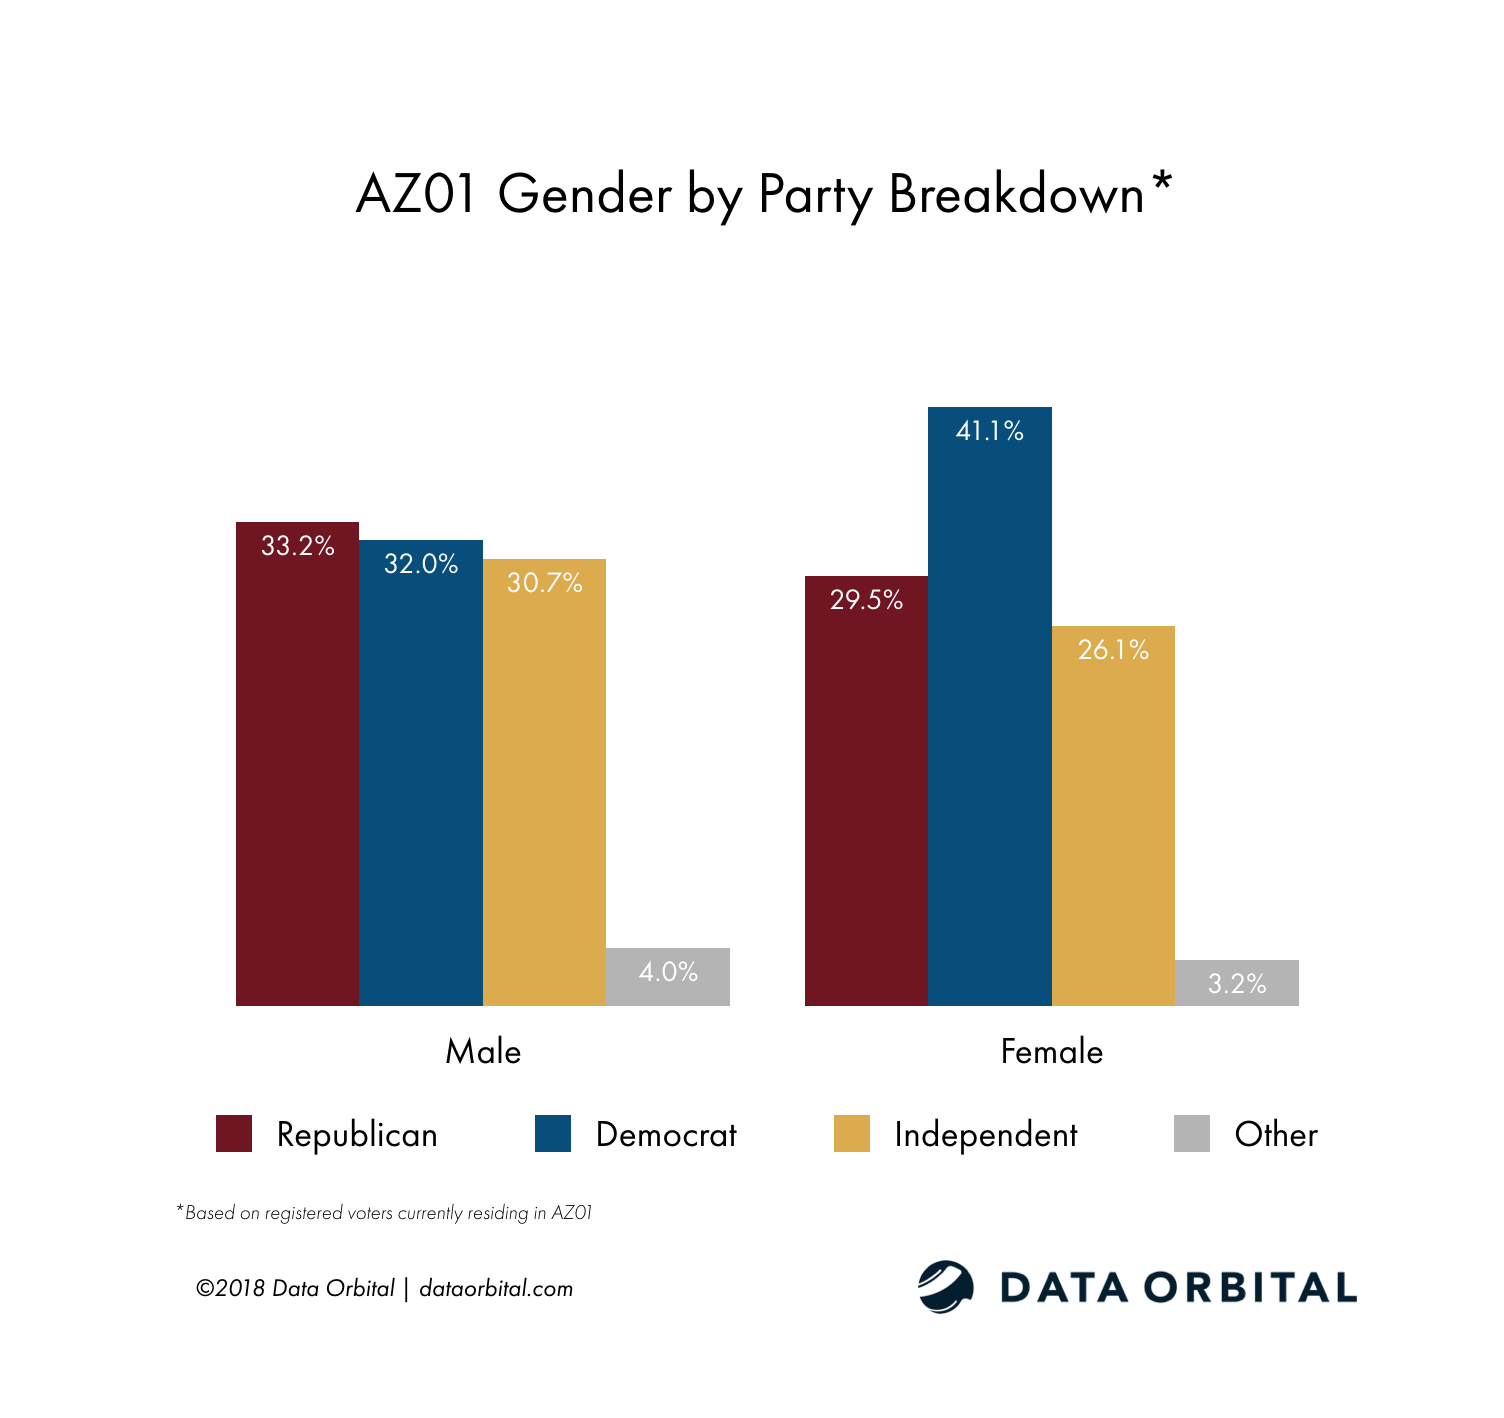 AZ01 District Profile Gender by Party Registration Breakdown